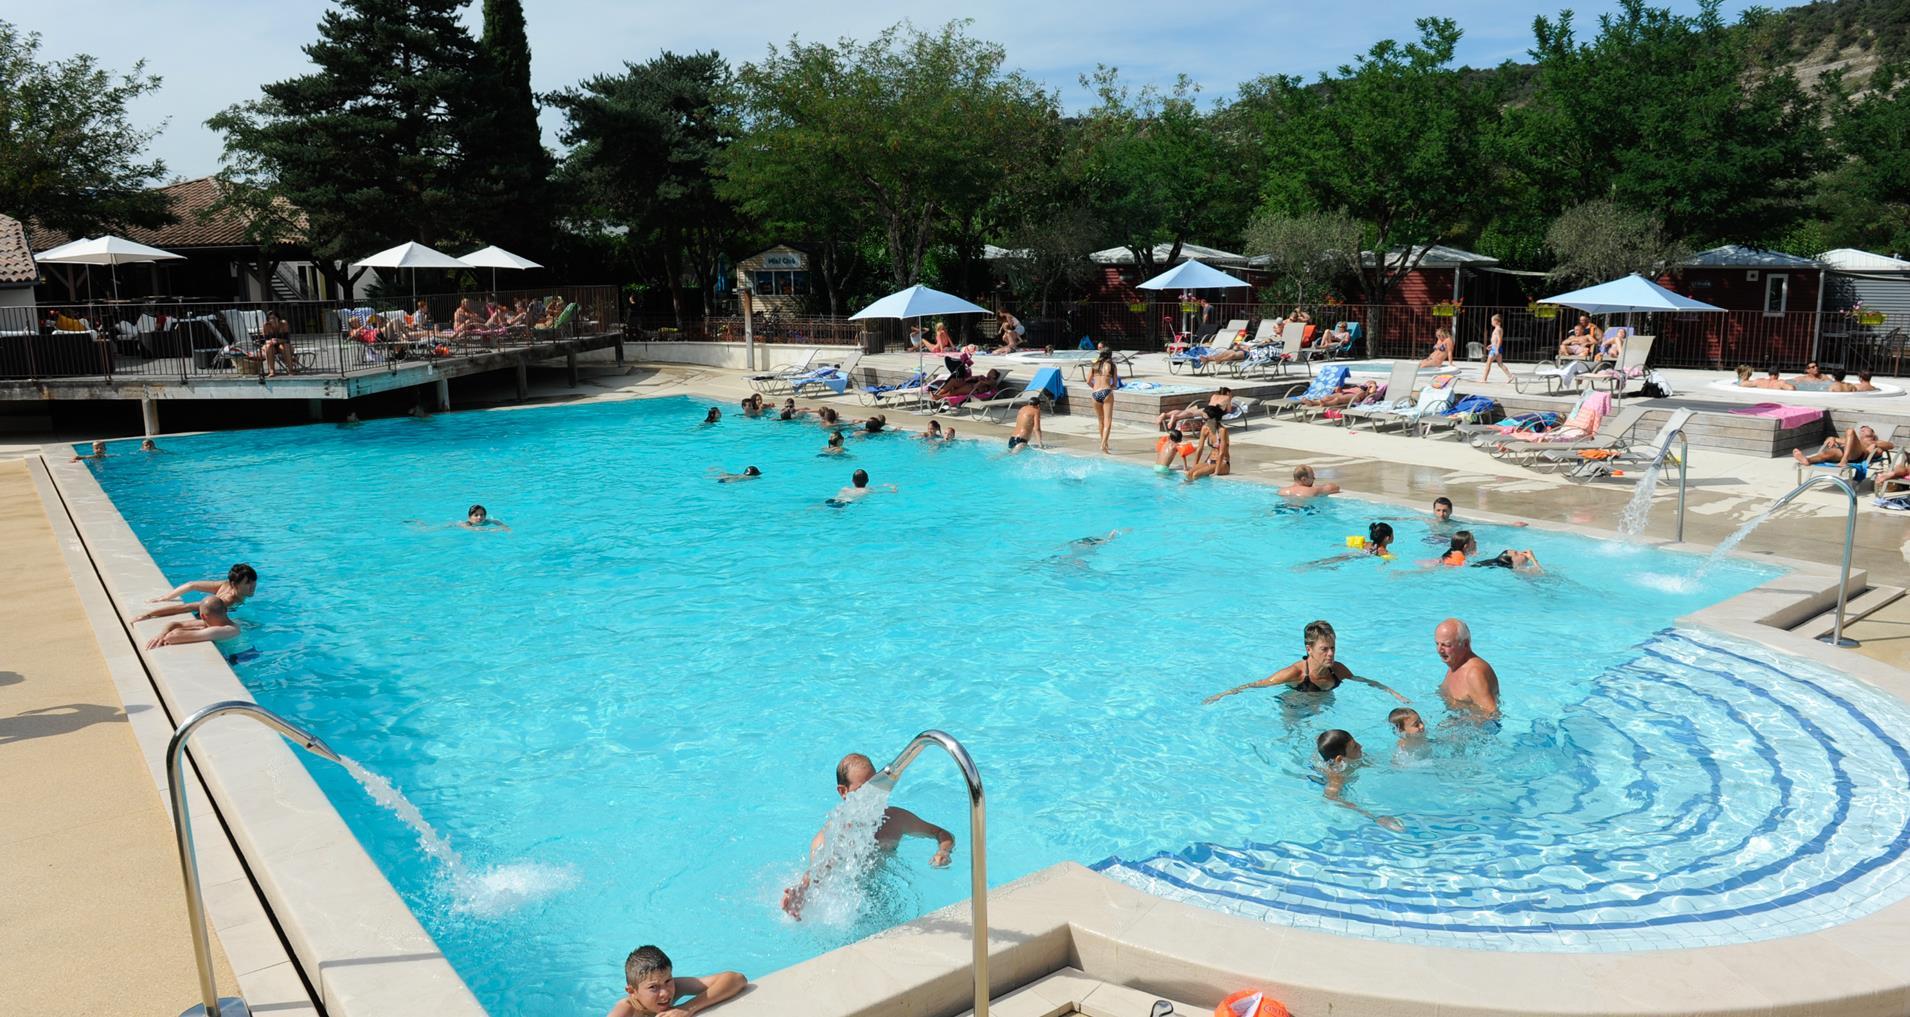 Camping ard che avec piscine yelloh village soleil vivarais for Camping ardeche ruoms avec piscine